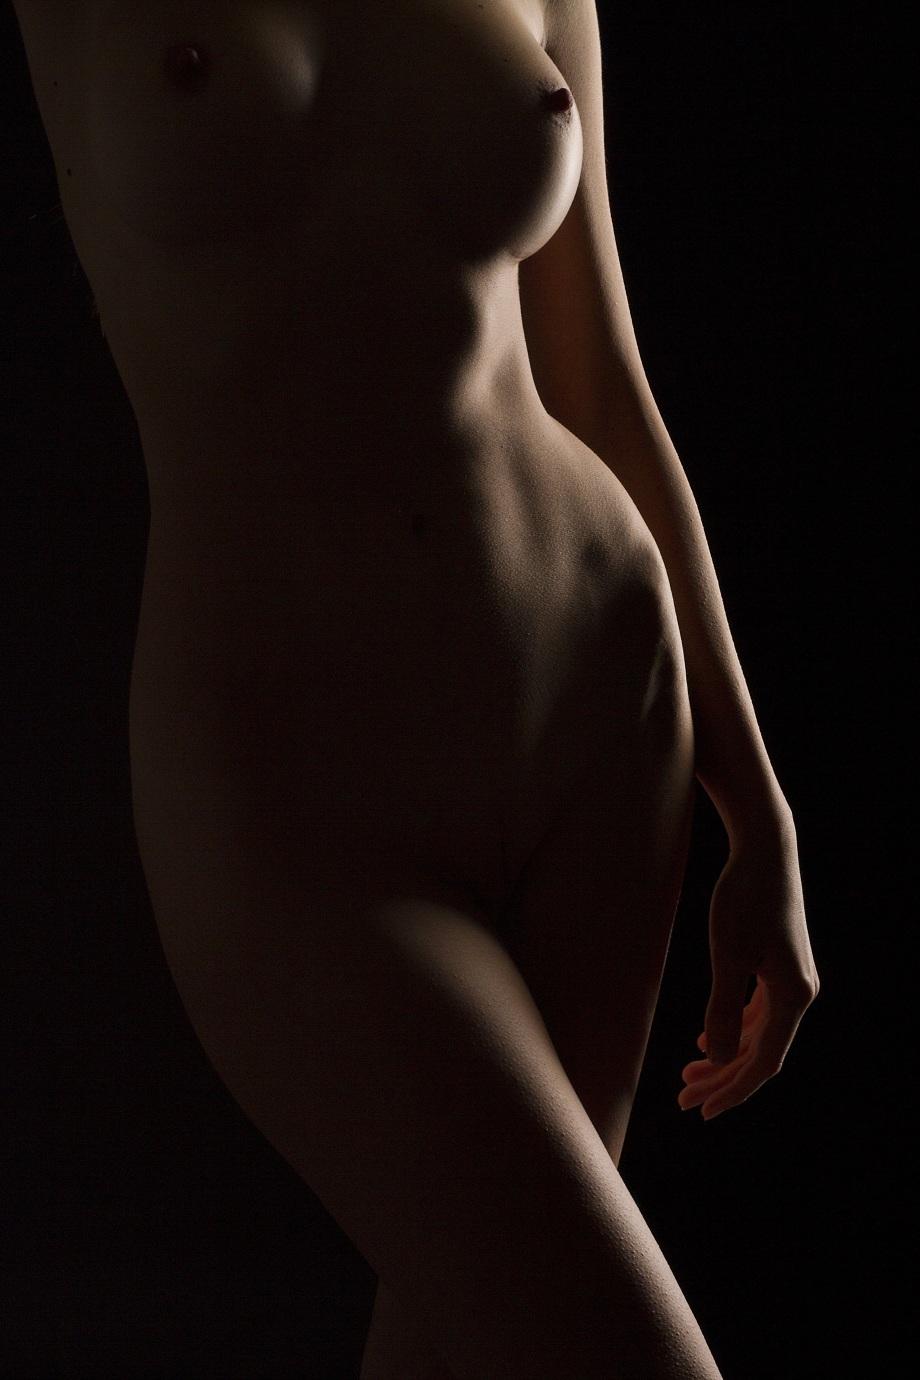 naked-3049568